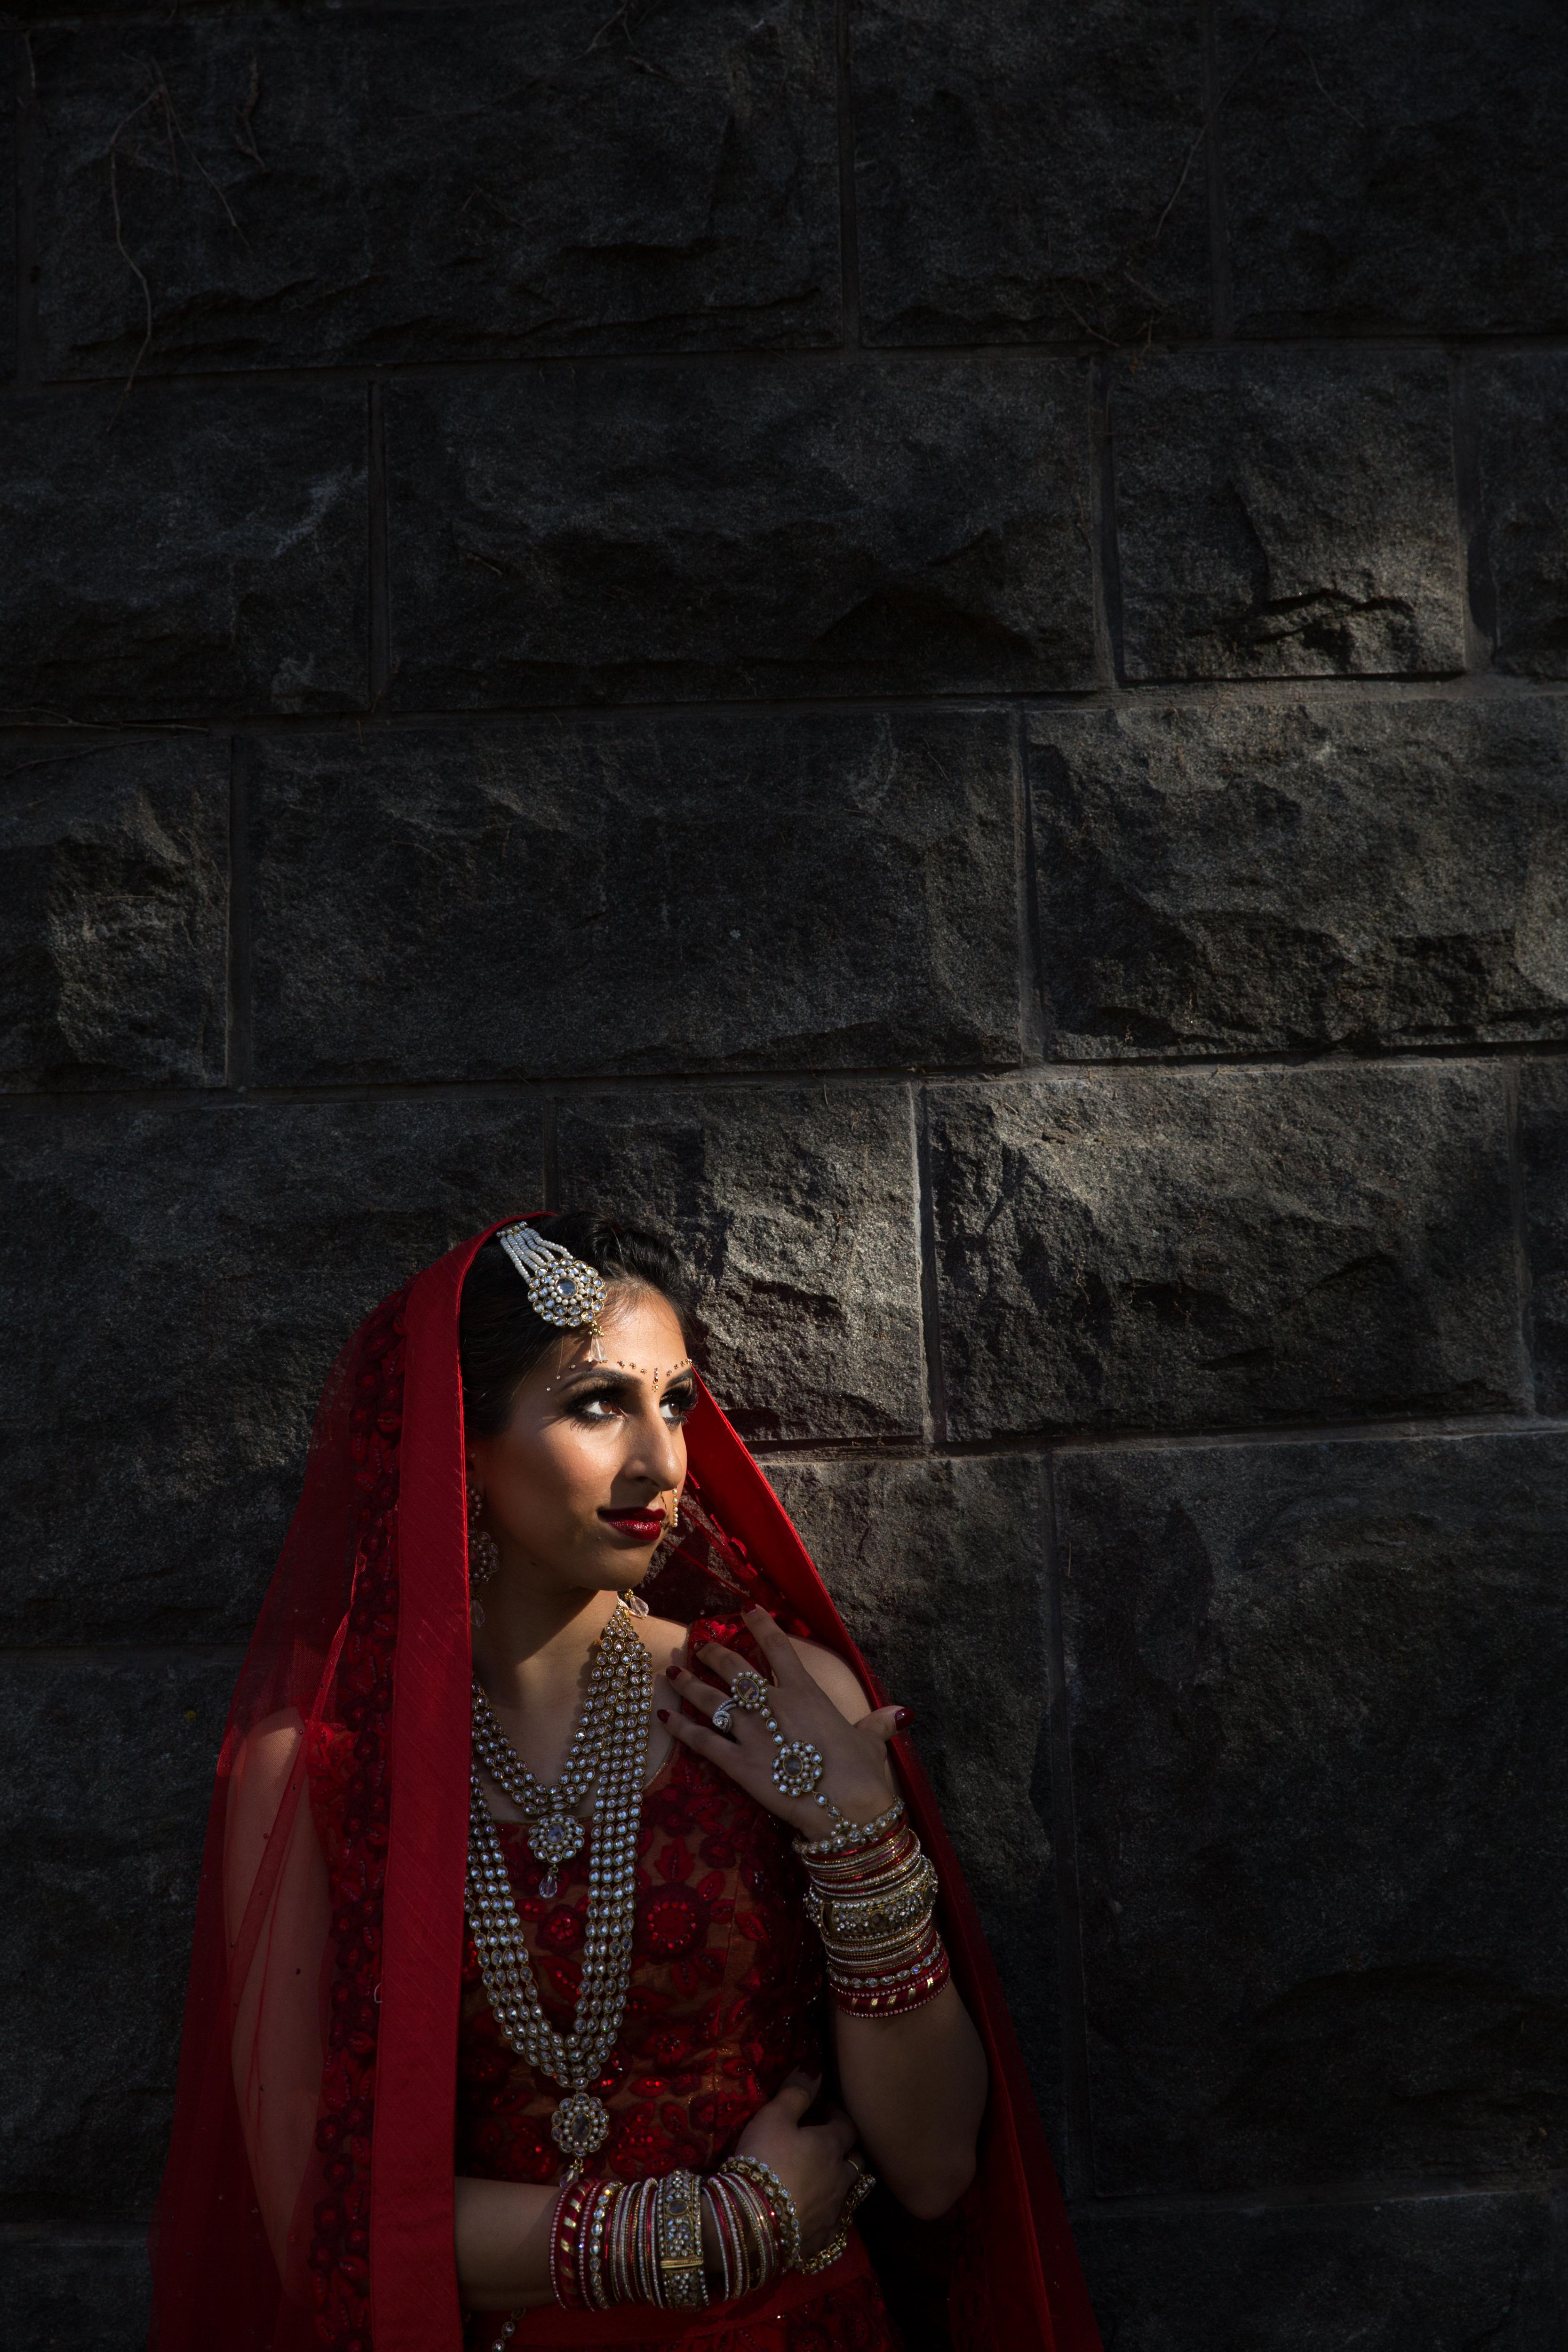 South Asian Weddings - Gillian Marto Creating Events of a Lifetime